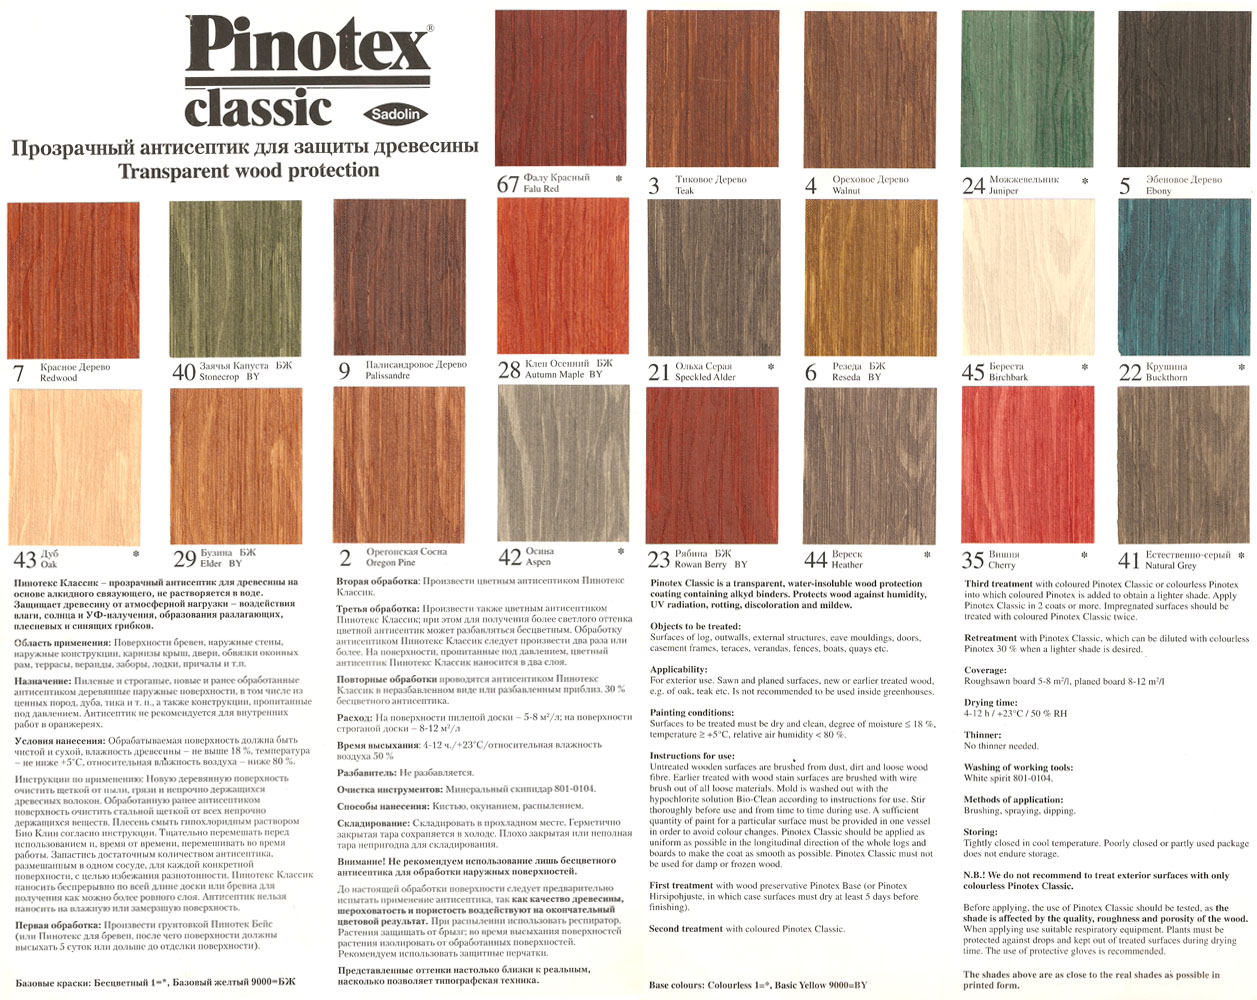 Пинотекс таблица цветов